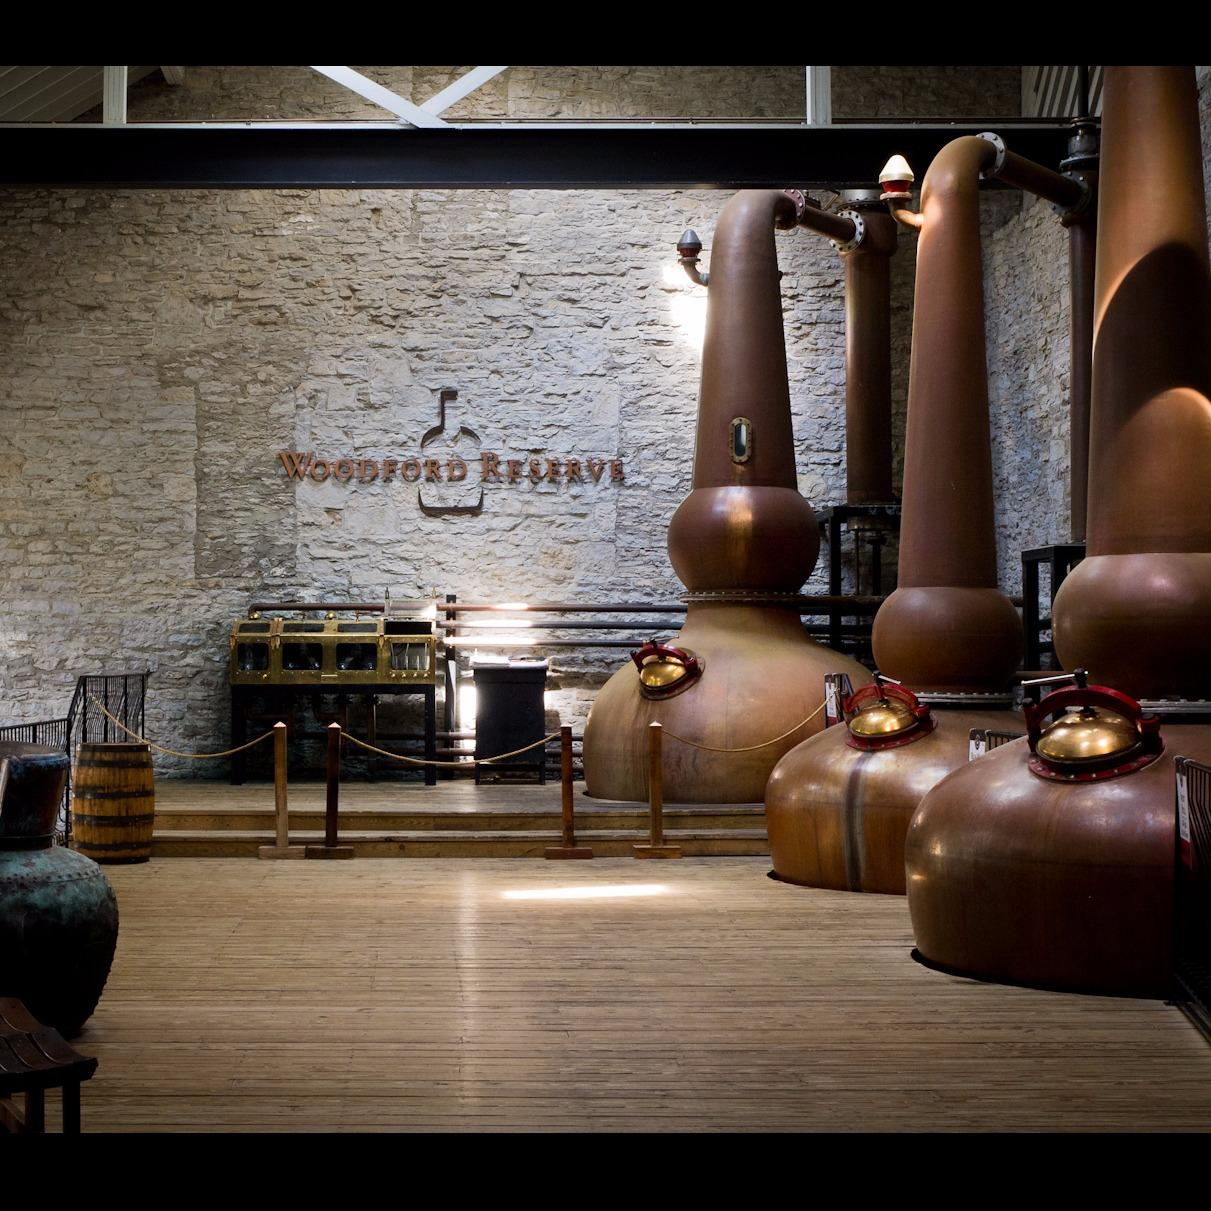 Woodford Reserve Distillery image 5